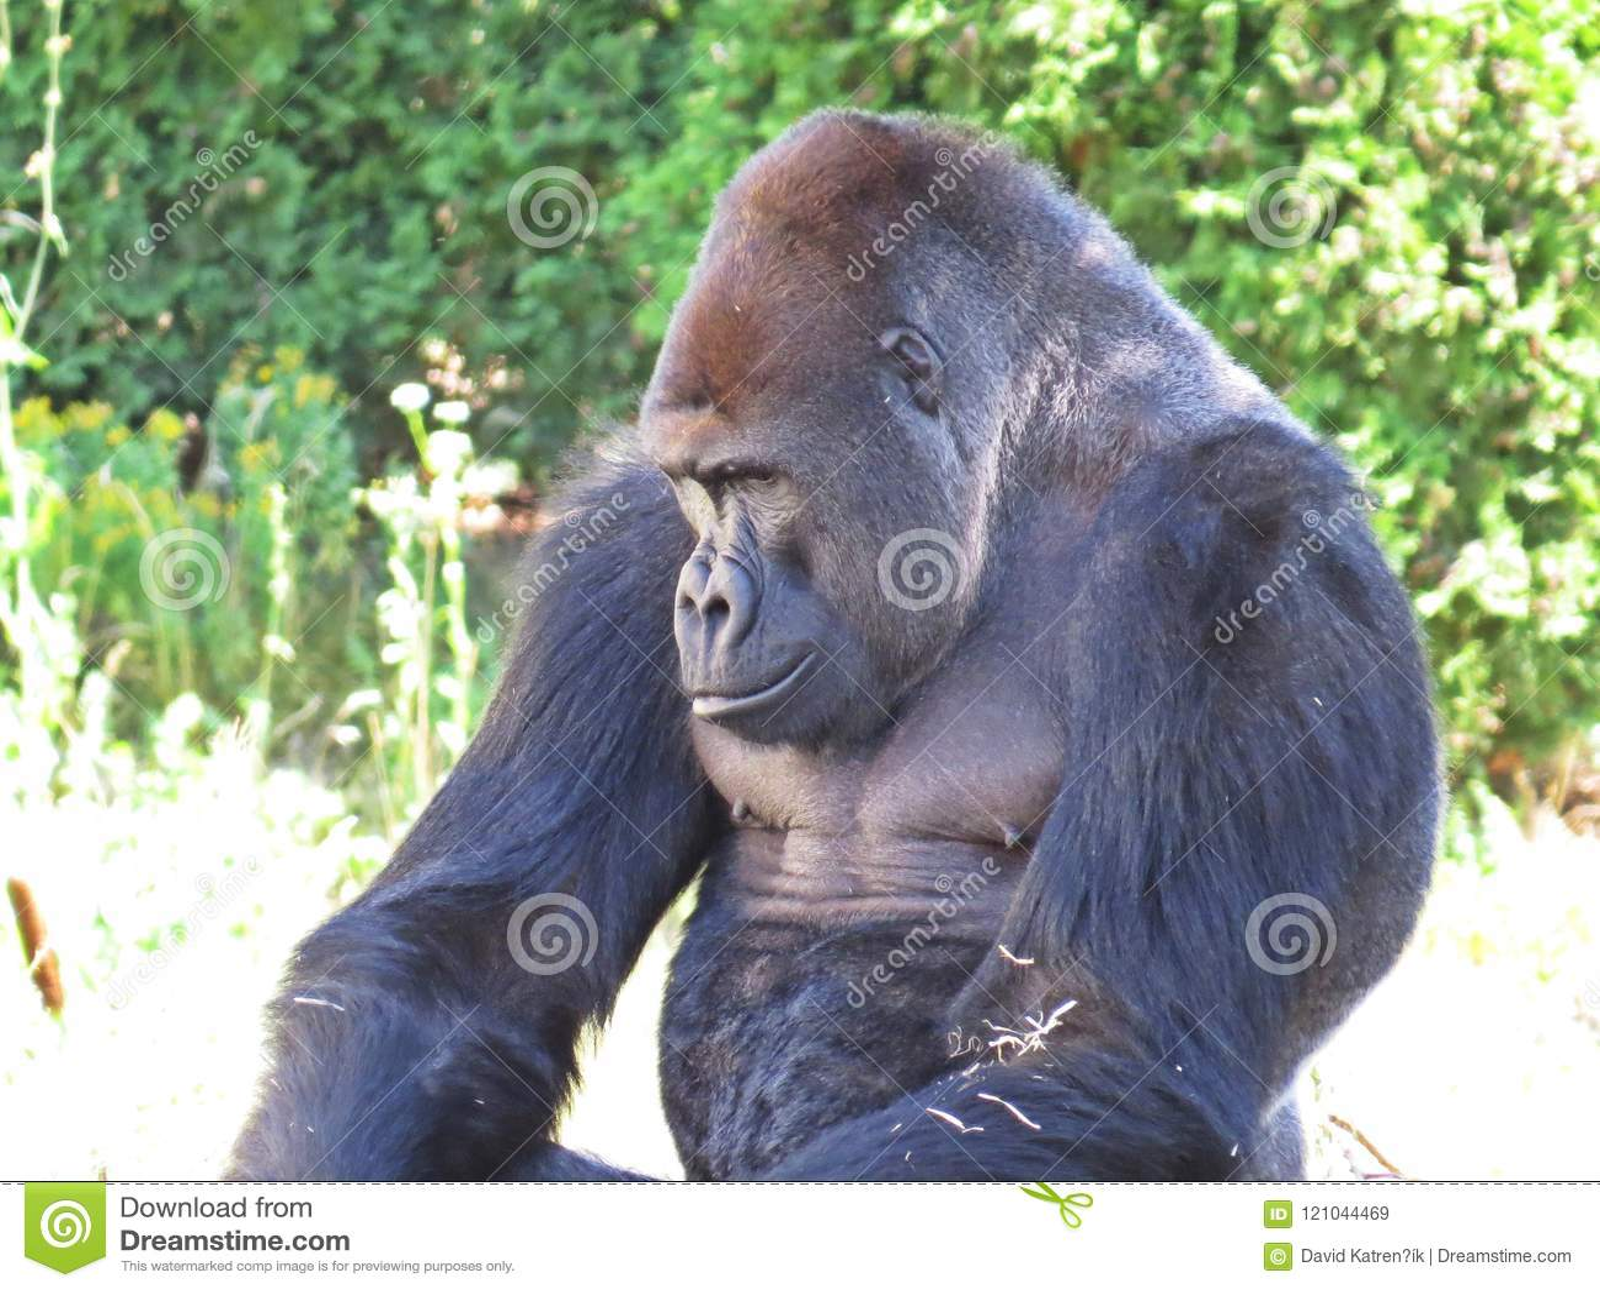 One Isolated Big Strong Black Monkey Ape Gorilla Head